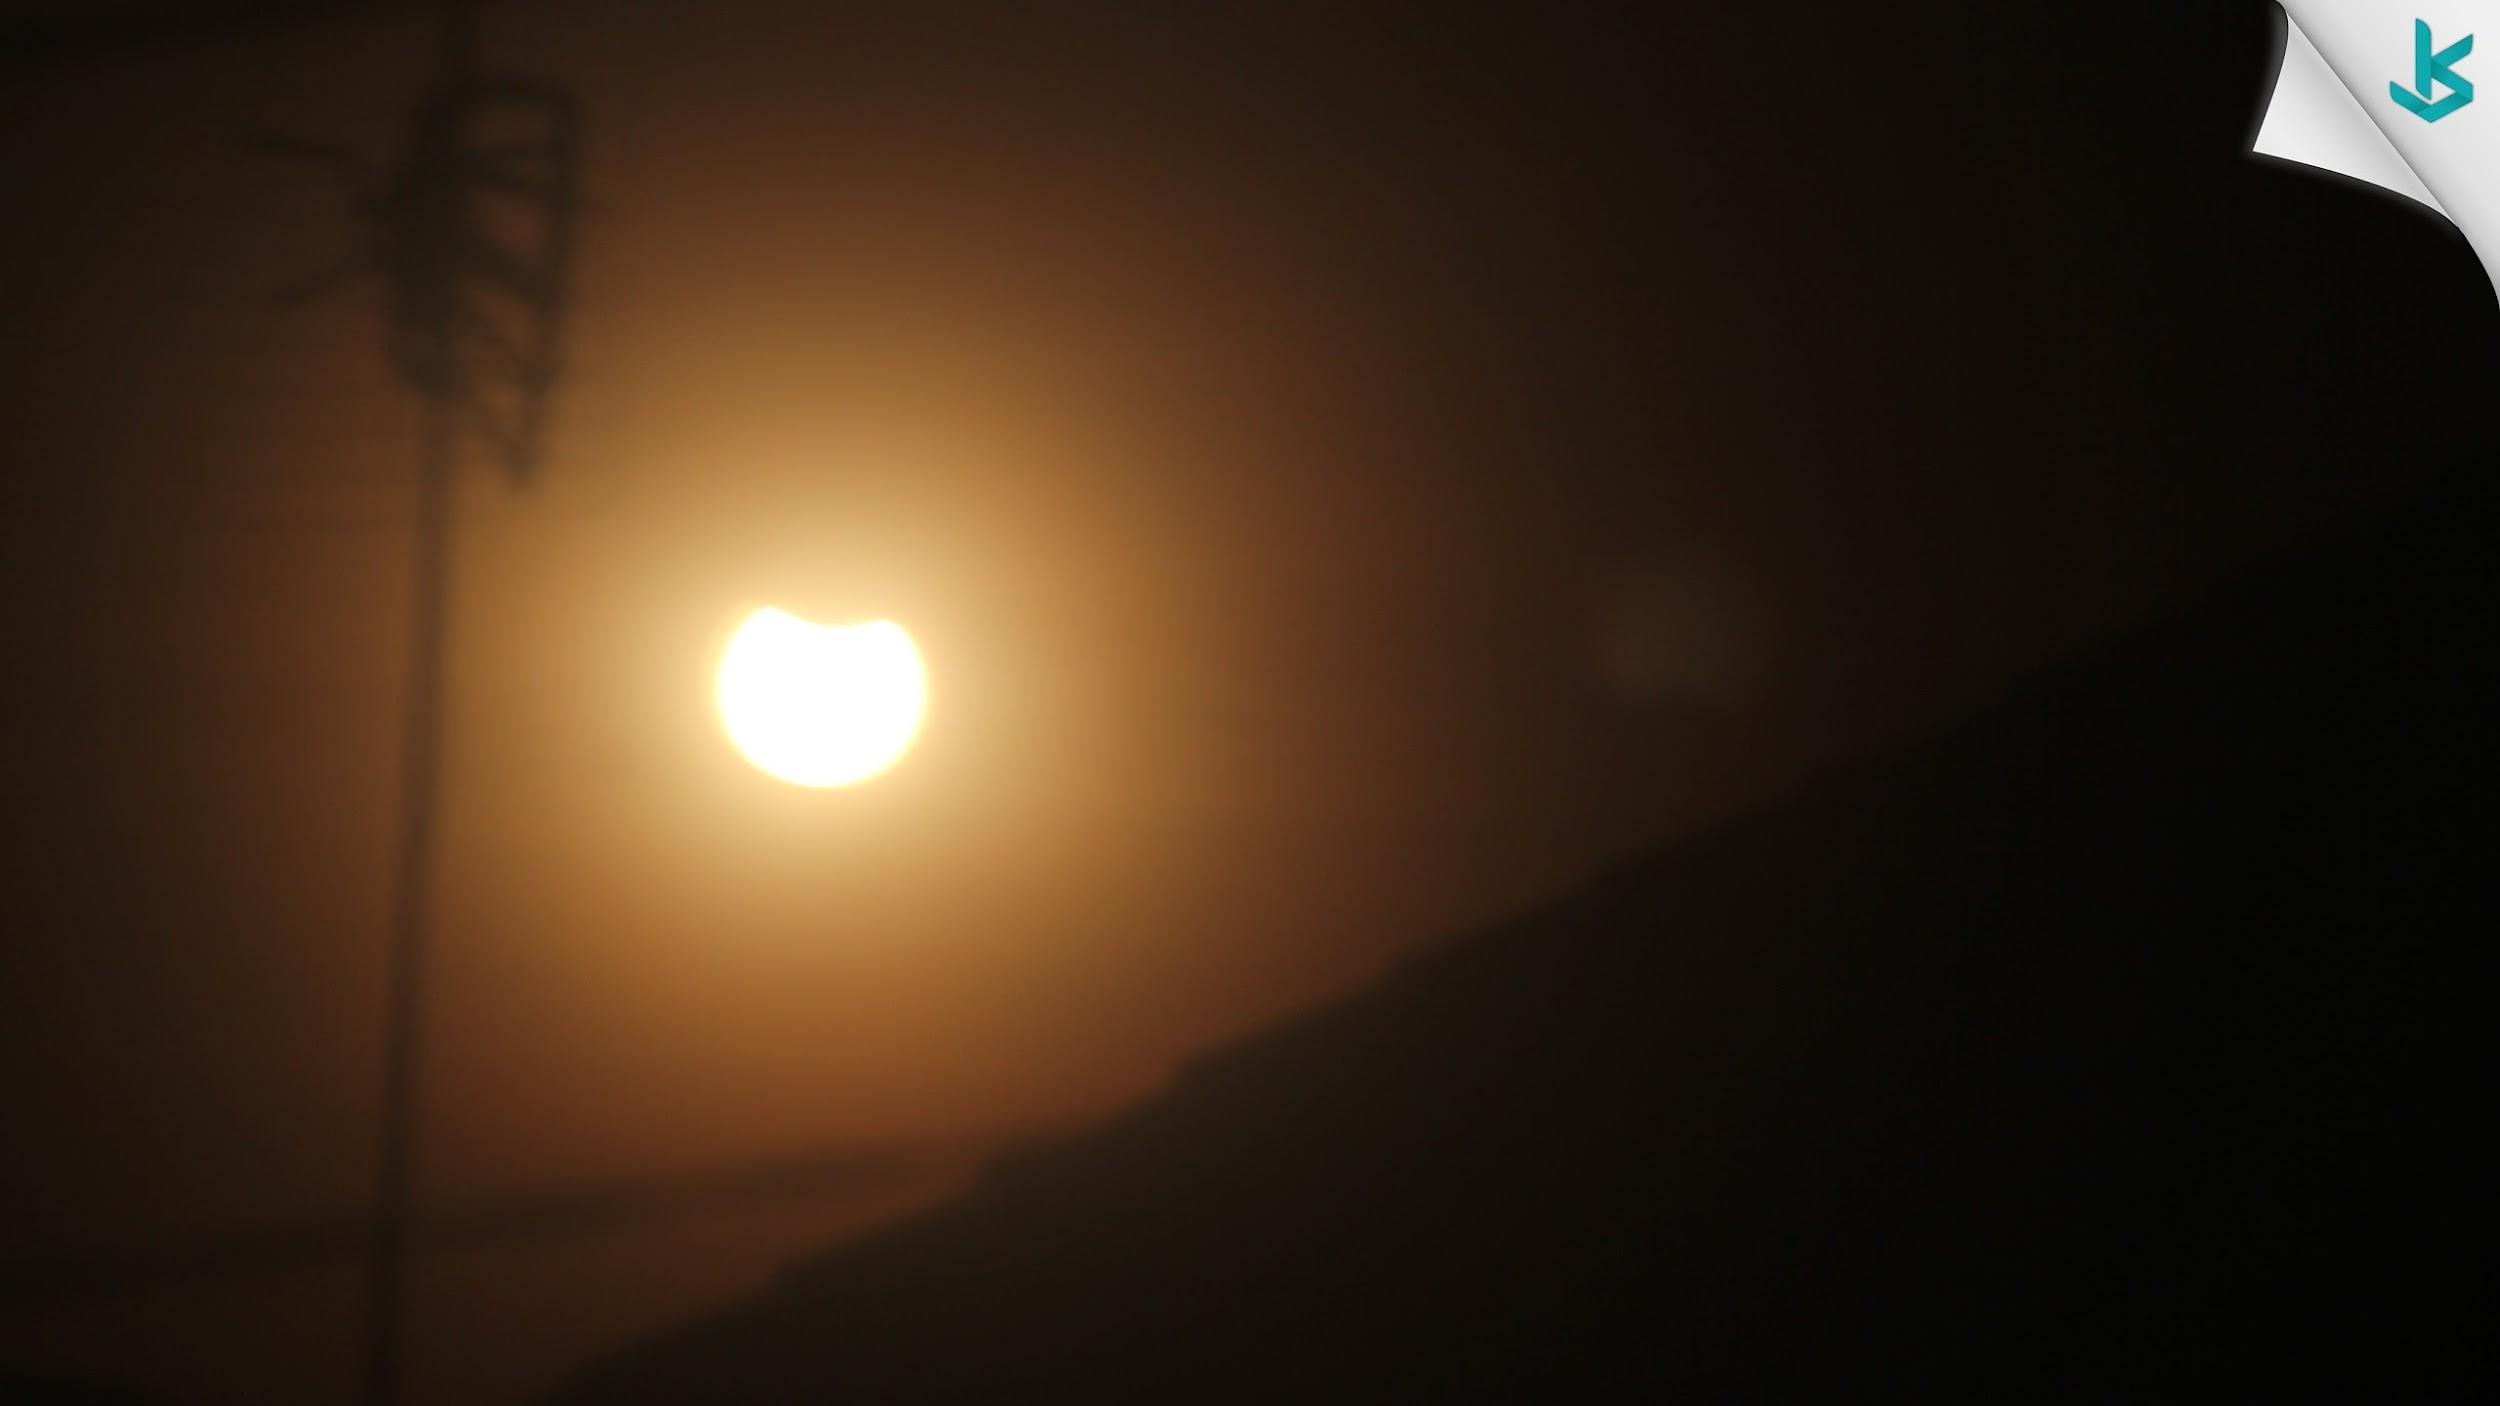 Penampakan Gerhana Matahari di Kota Serang - Banten 09 Maret 2016